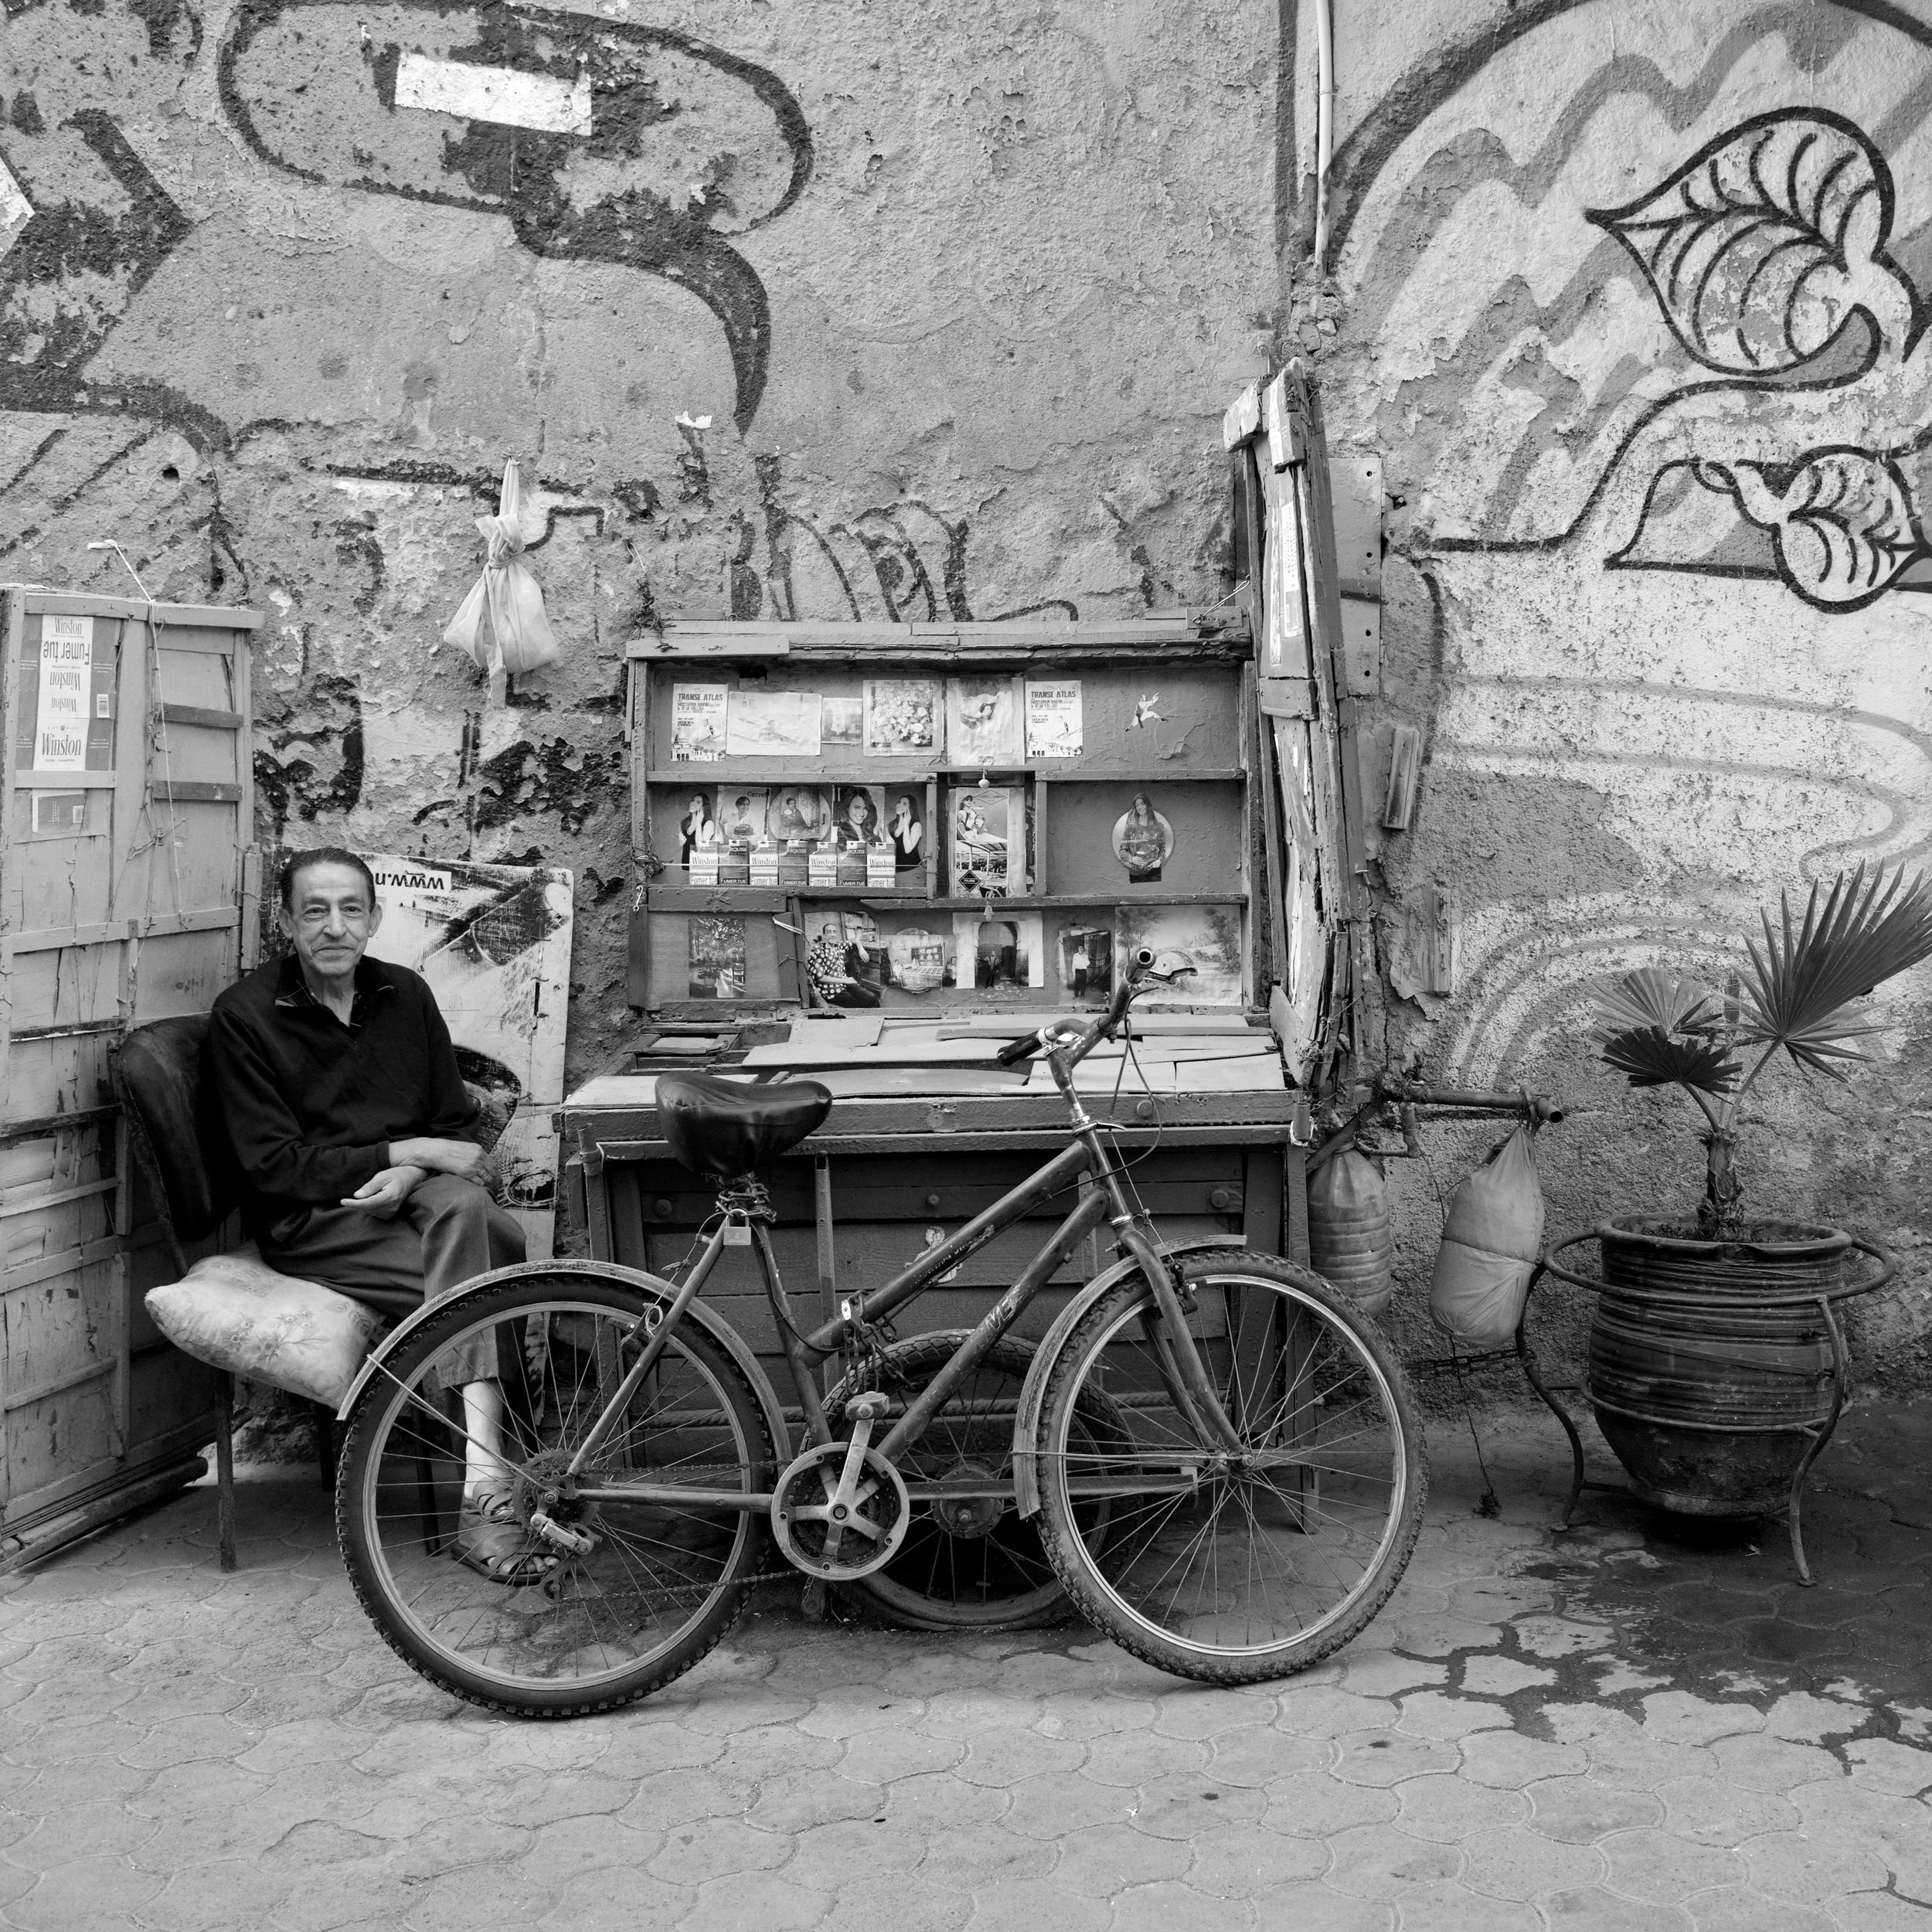 Marrakesh Book Seller